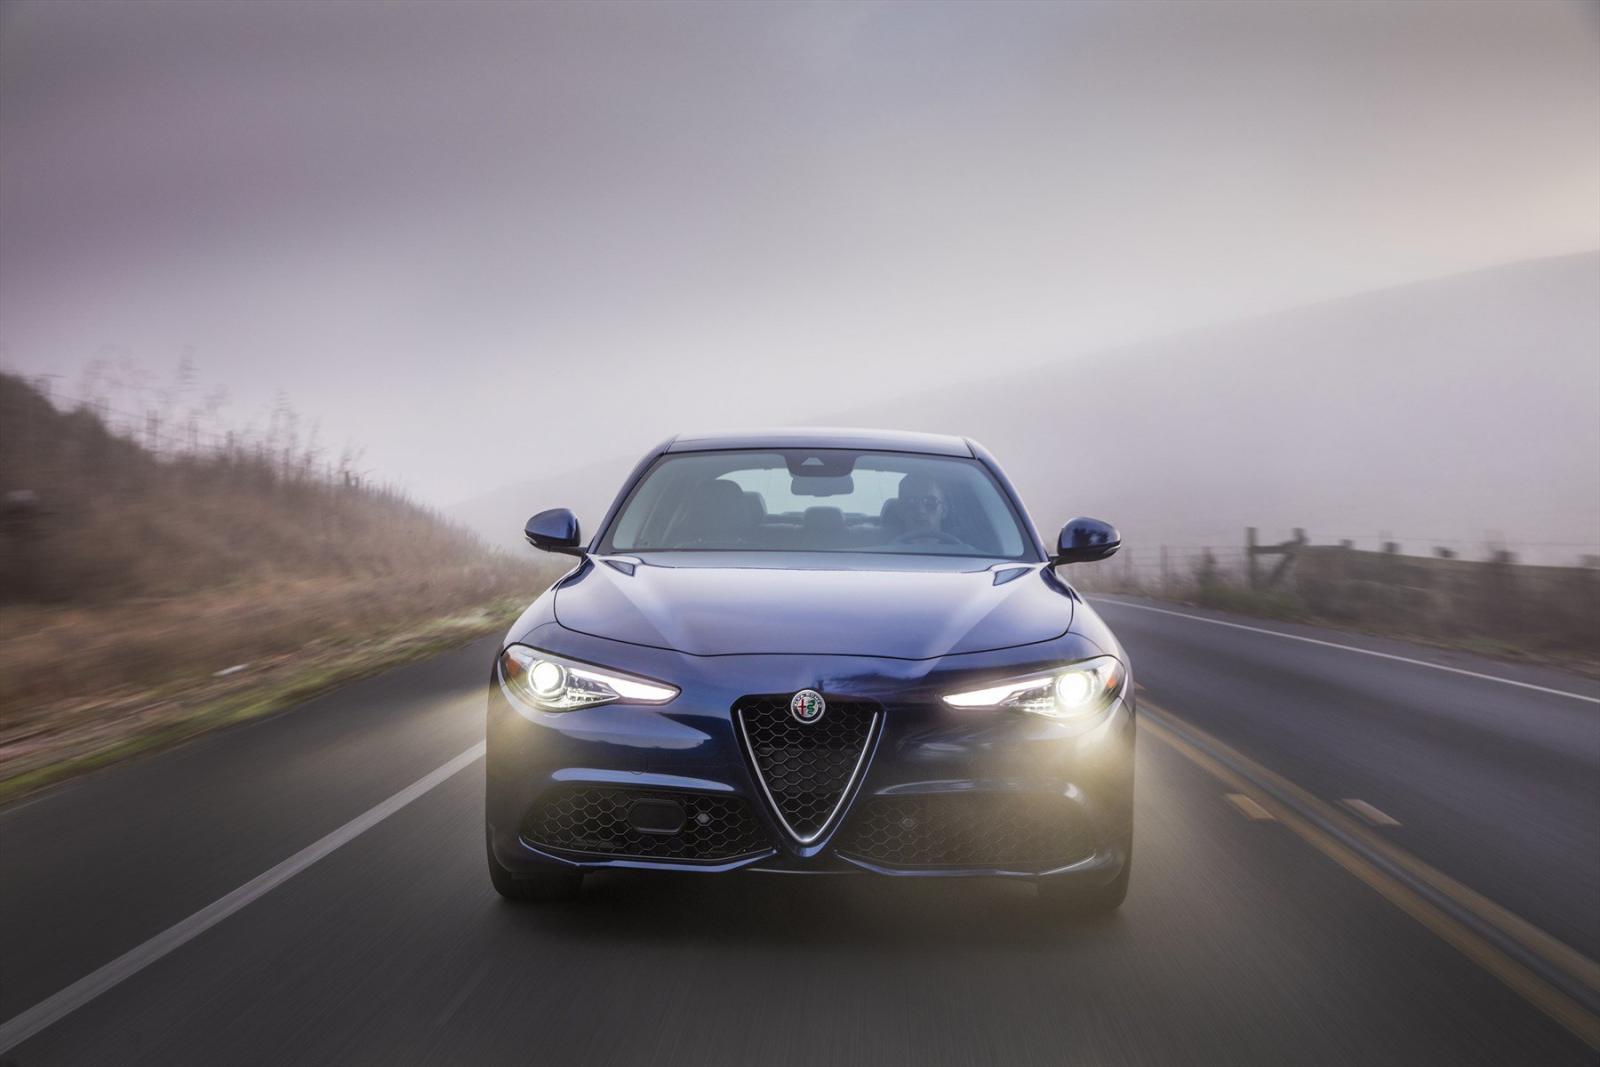 giulia2 Είναι η Alfa Romeo Giulia τόσο καλή όσο λένε; Alfa, alfa romeo, Alfa Romeo Giulia, TEST, ΔΟΚΙΜΕΣ, οδηγούμε